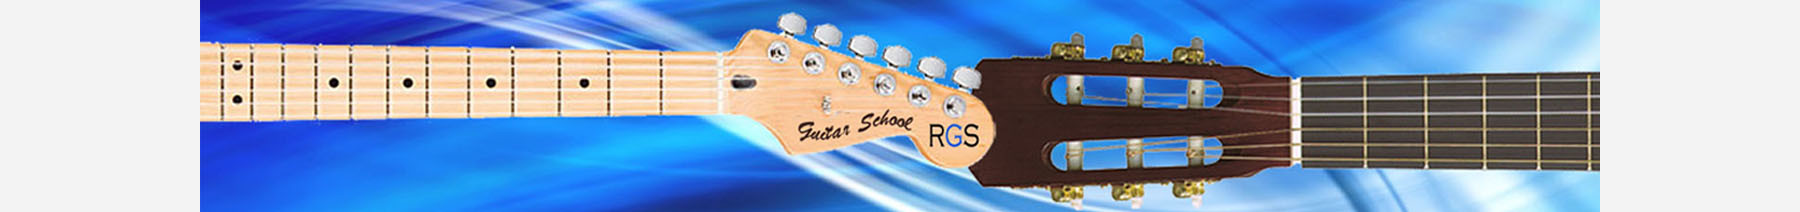 Reggio Guitar School